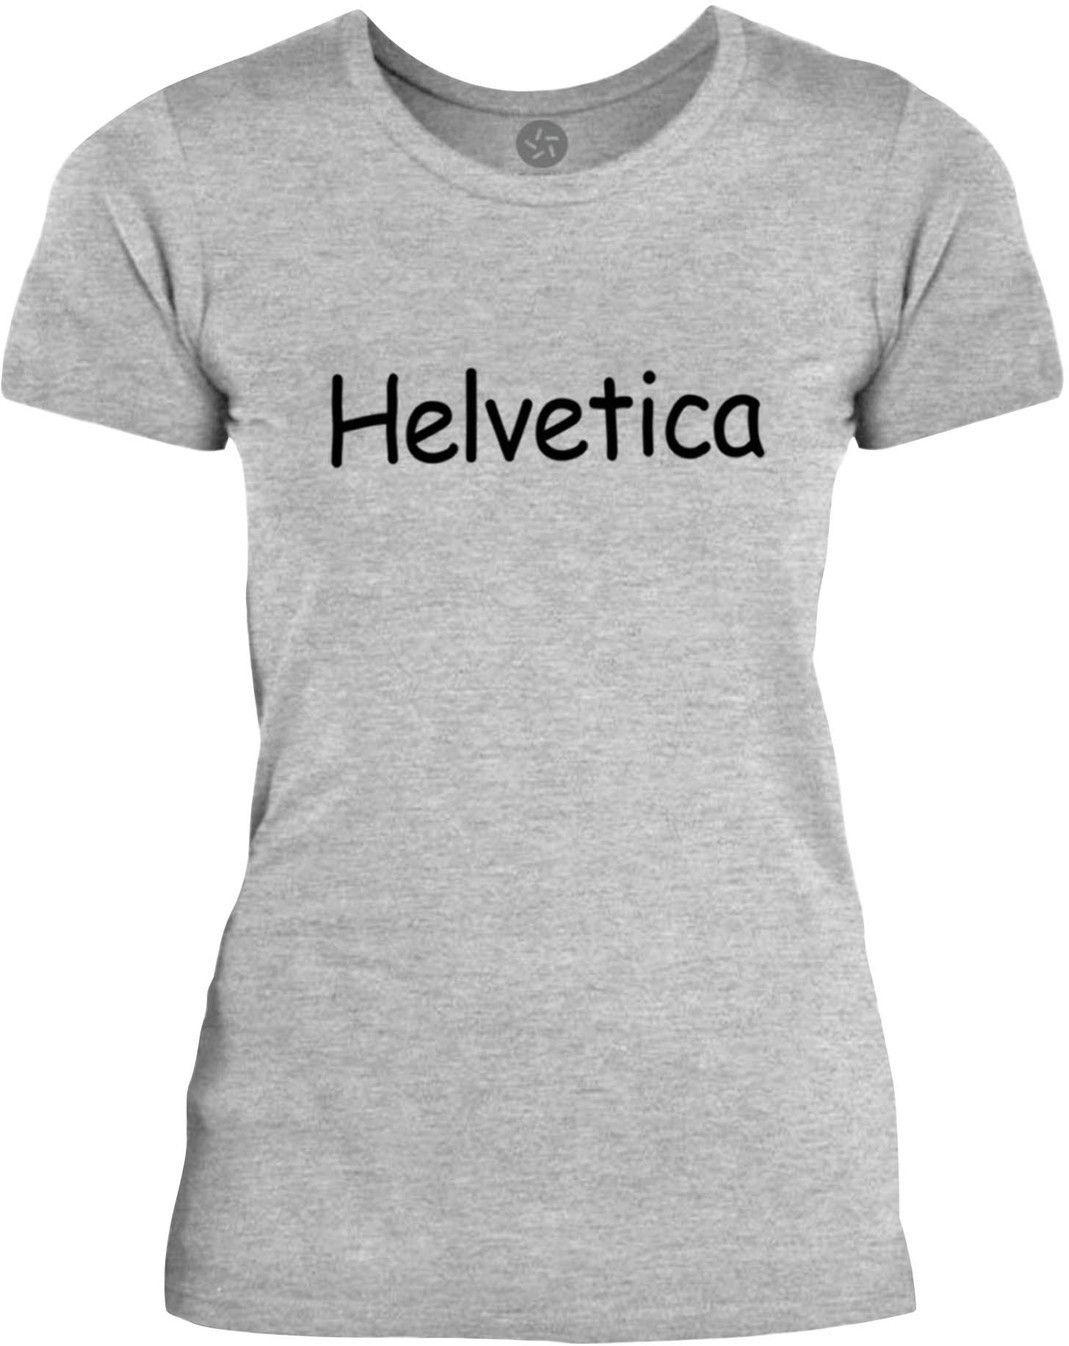 Big Texas Helvetica Comic Sans (Black) Womens Fine Jersey T-Shirt